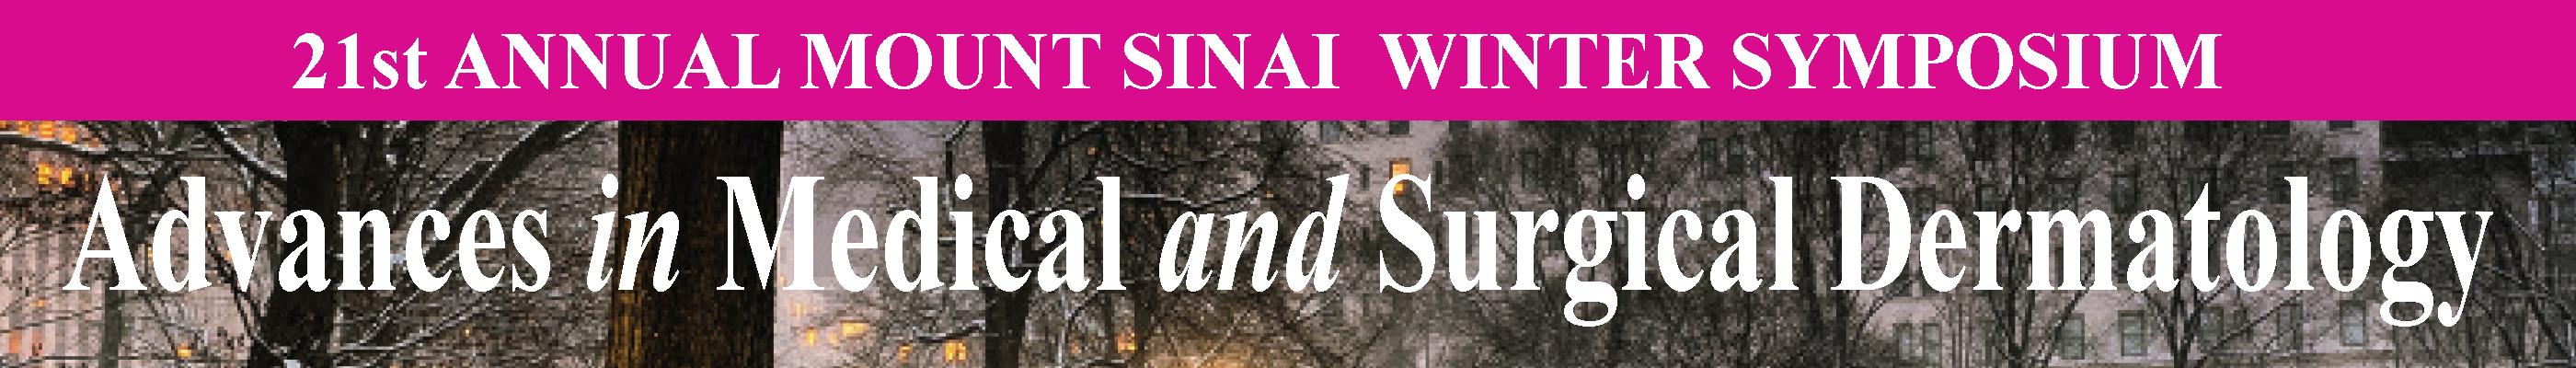 21st Annual Mount Sinai Winter Symposium - Icahn School of